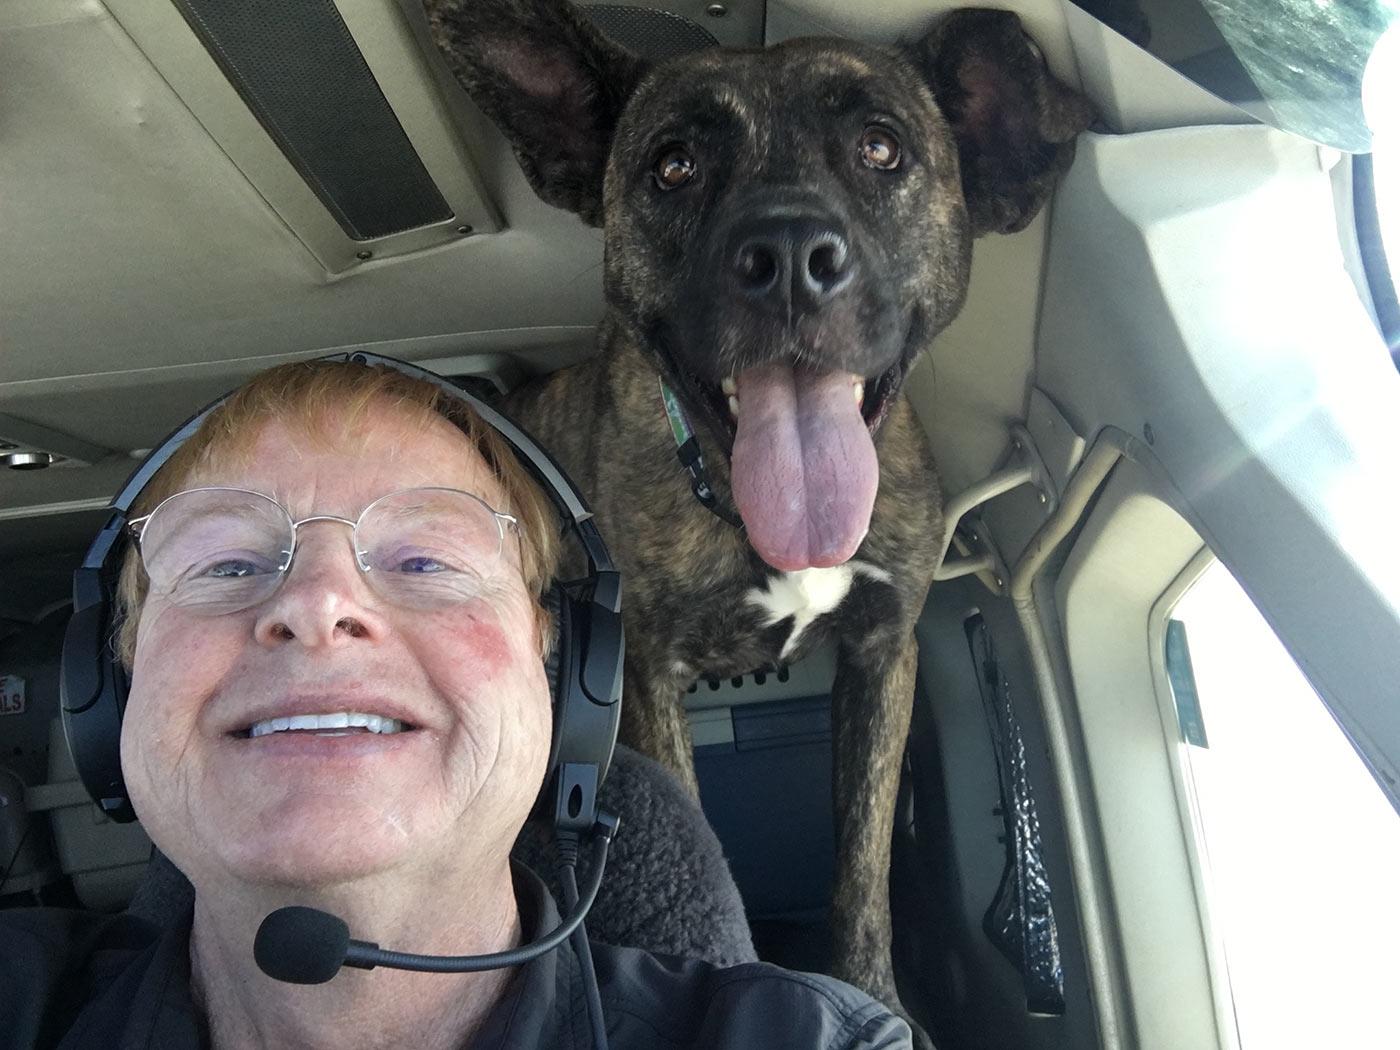 Wyoming: Peter E. Rork Flies the Pet-Friendly Skies